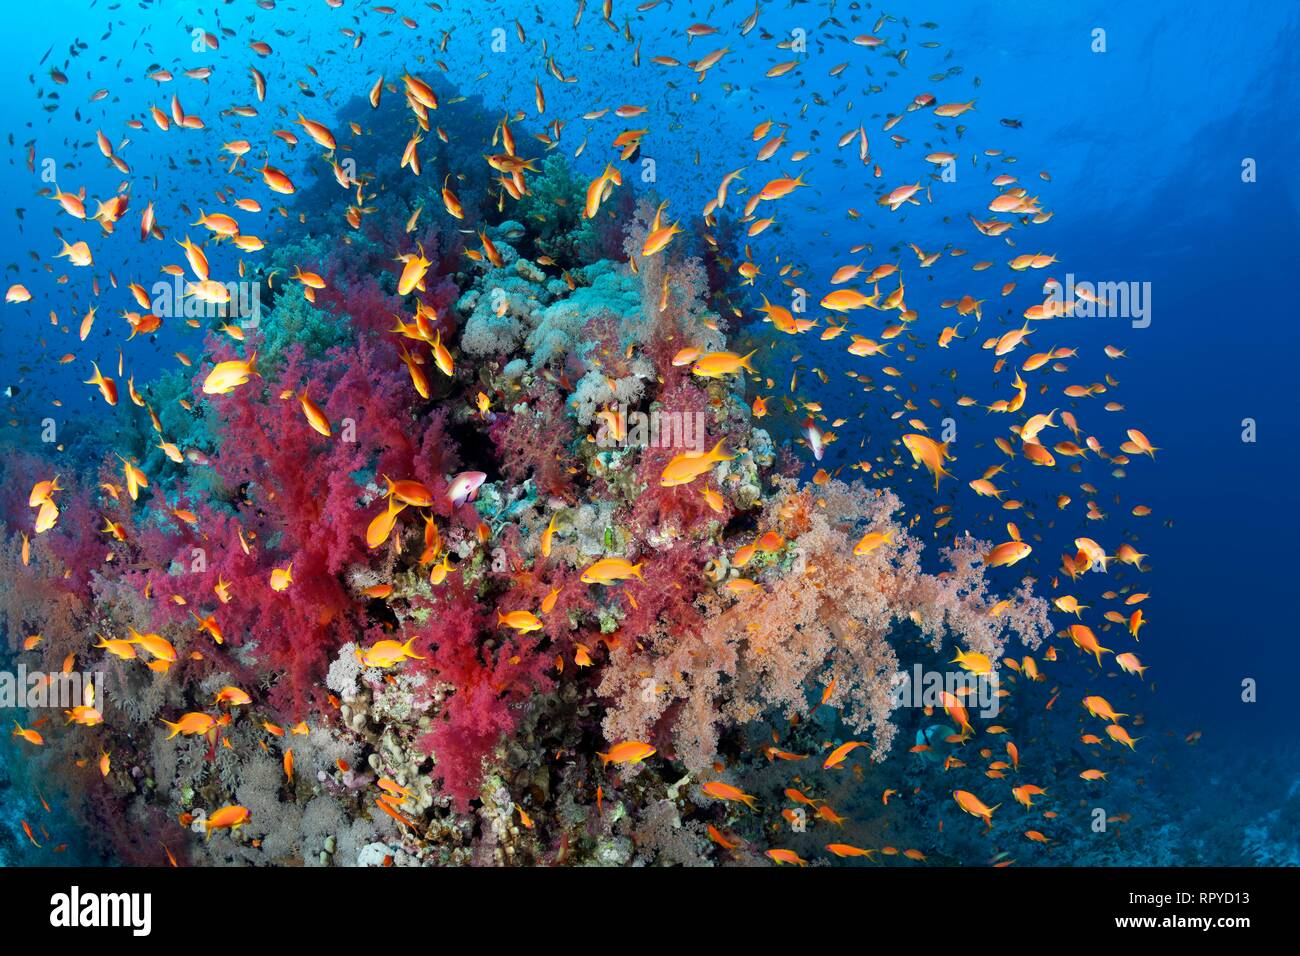 Coral reef, coral block densely covered with Klunzinger's Soft Corals (Dendronephthya klunzingeri), swarm Anthias (Anthiinae) - Stock Image